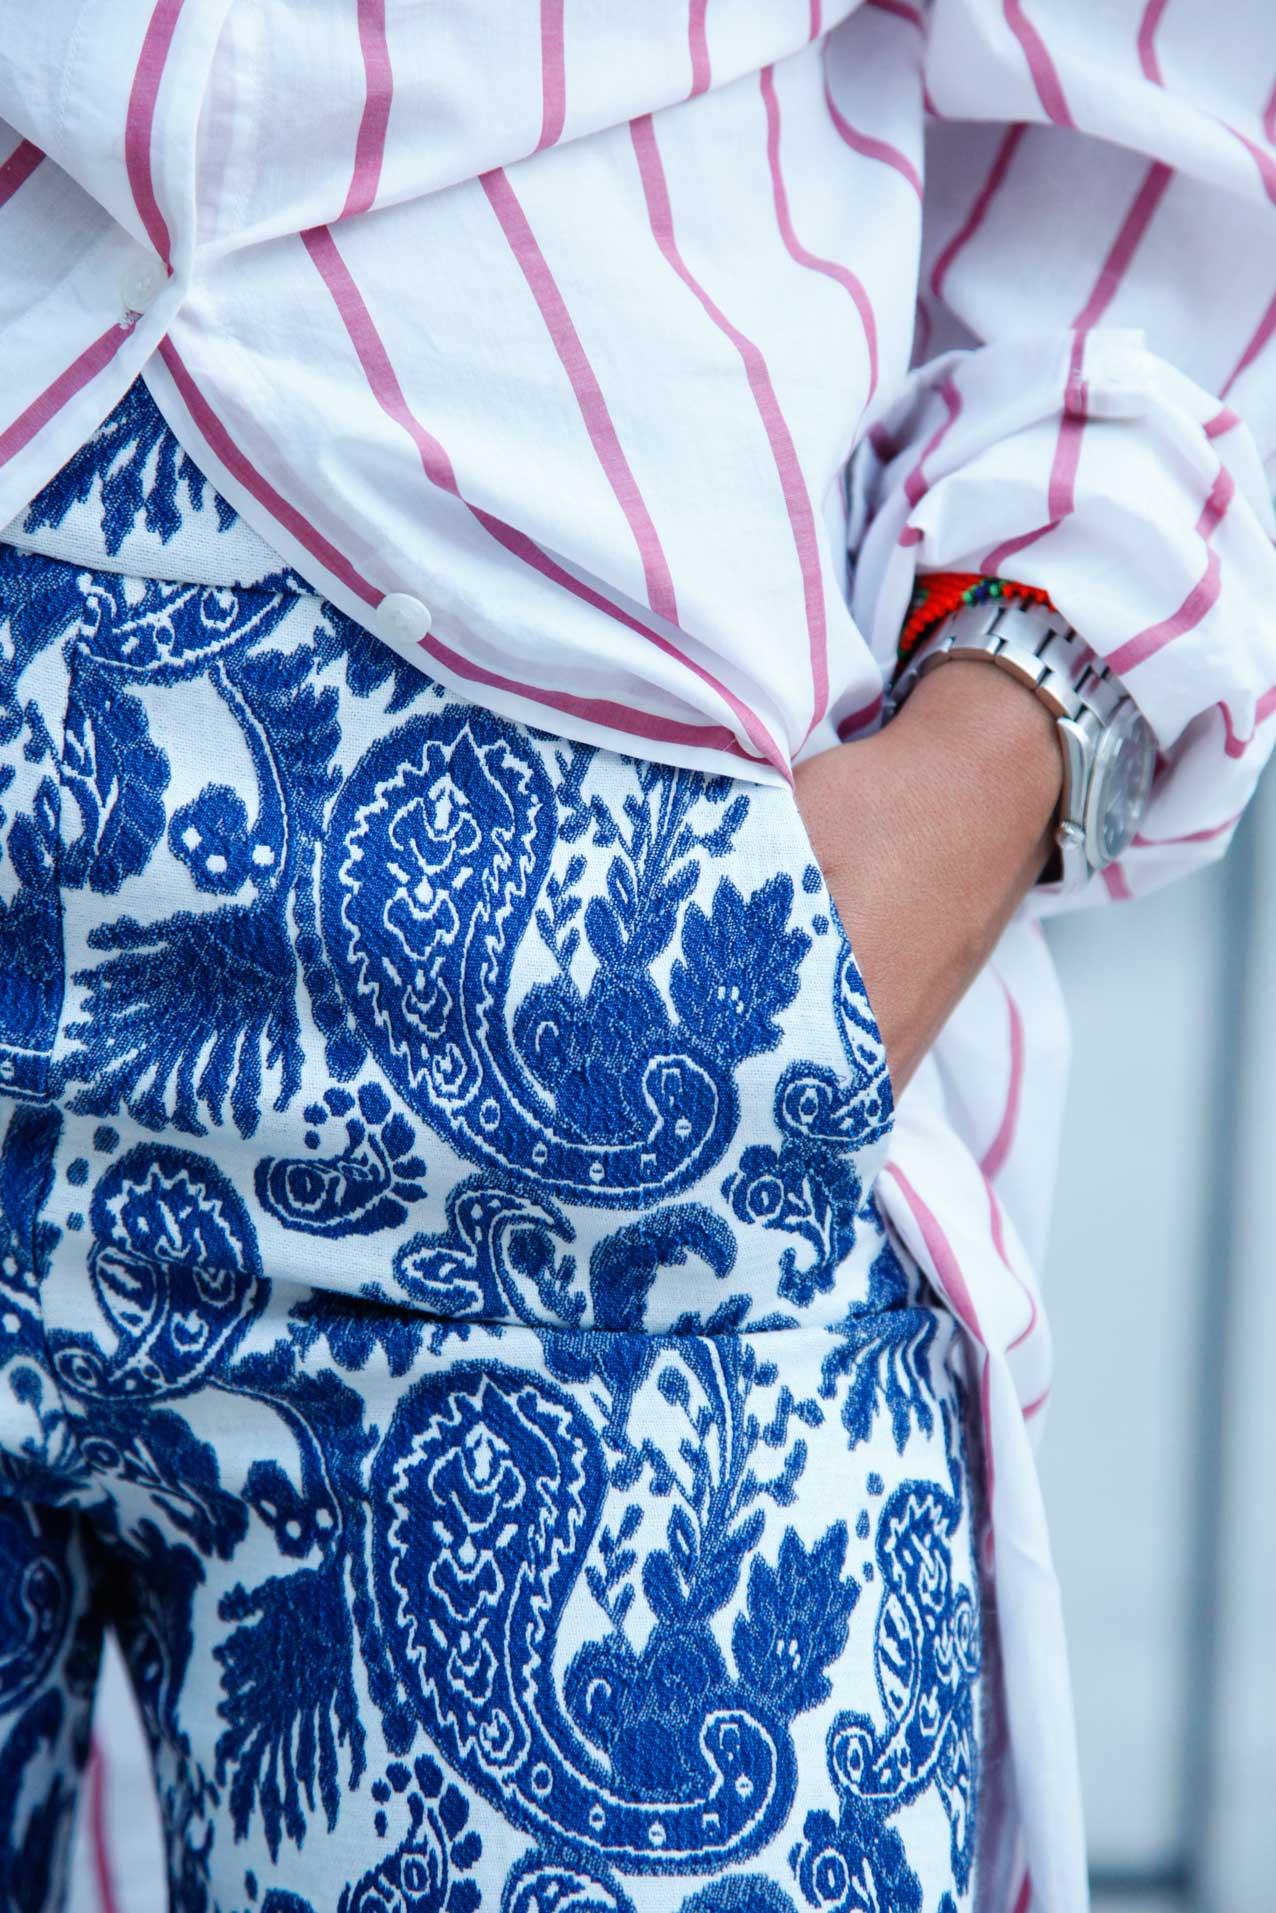 new_shirt-cool_lemonade-tapizado-velvet_platforms-streetstyle10